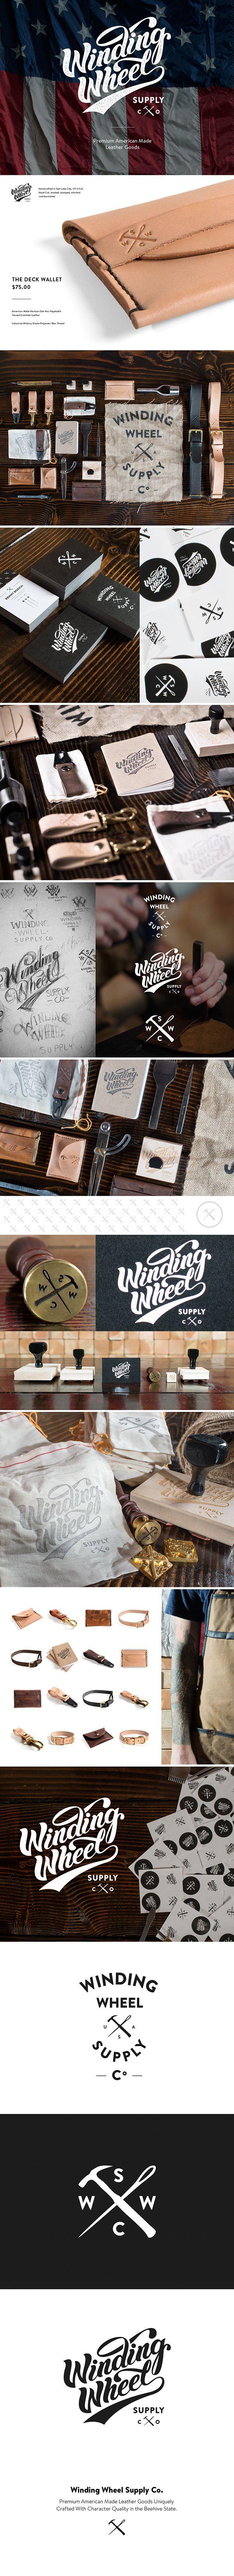 Winding Wheel Supply Co on Behance